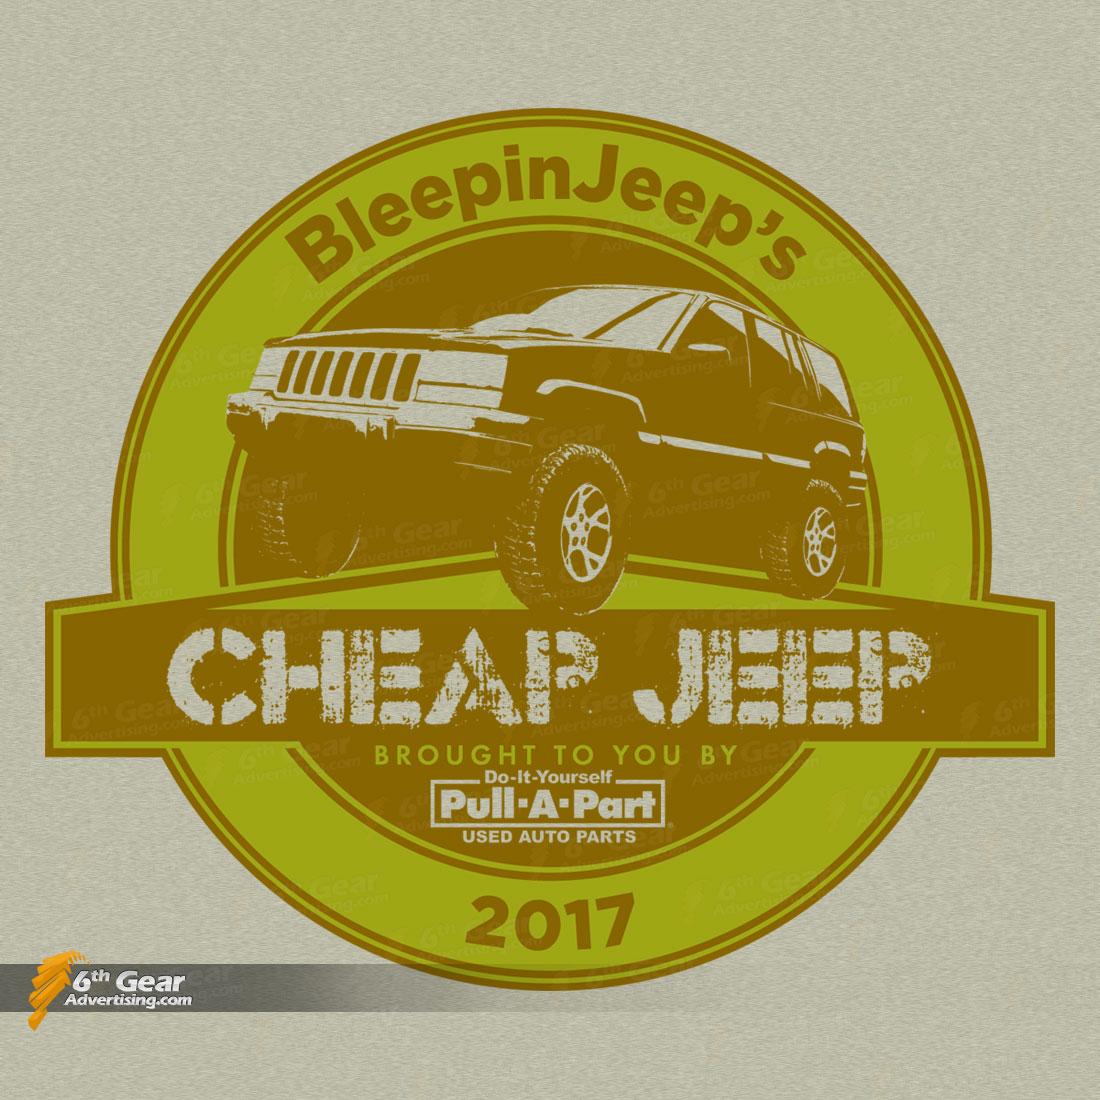 Cheap Jeep 2017